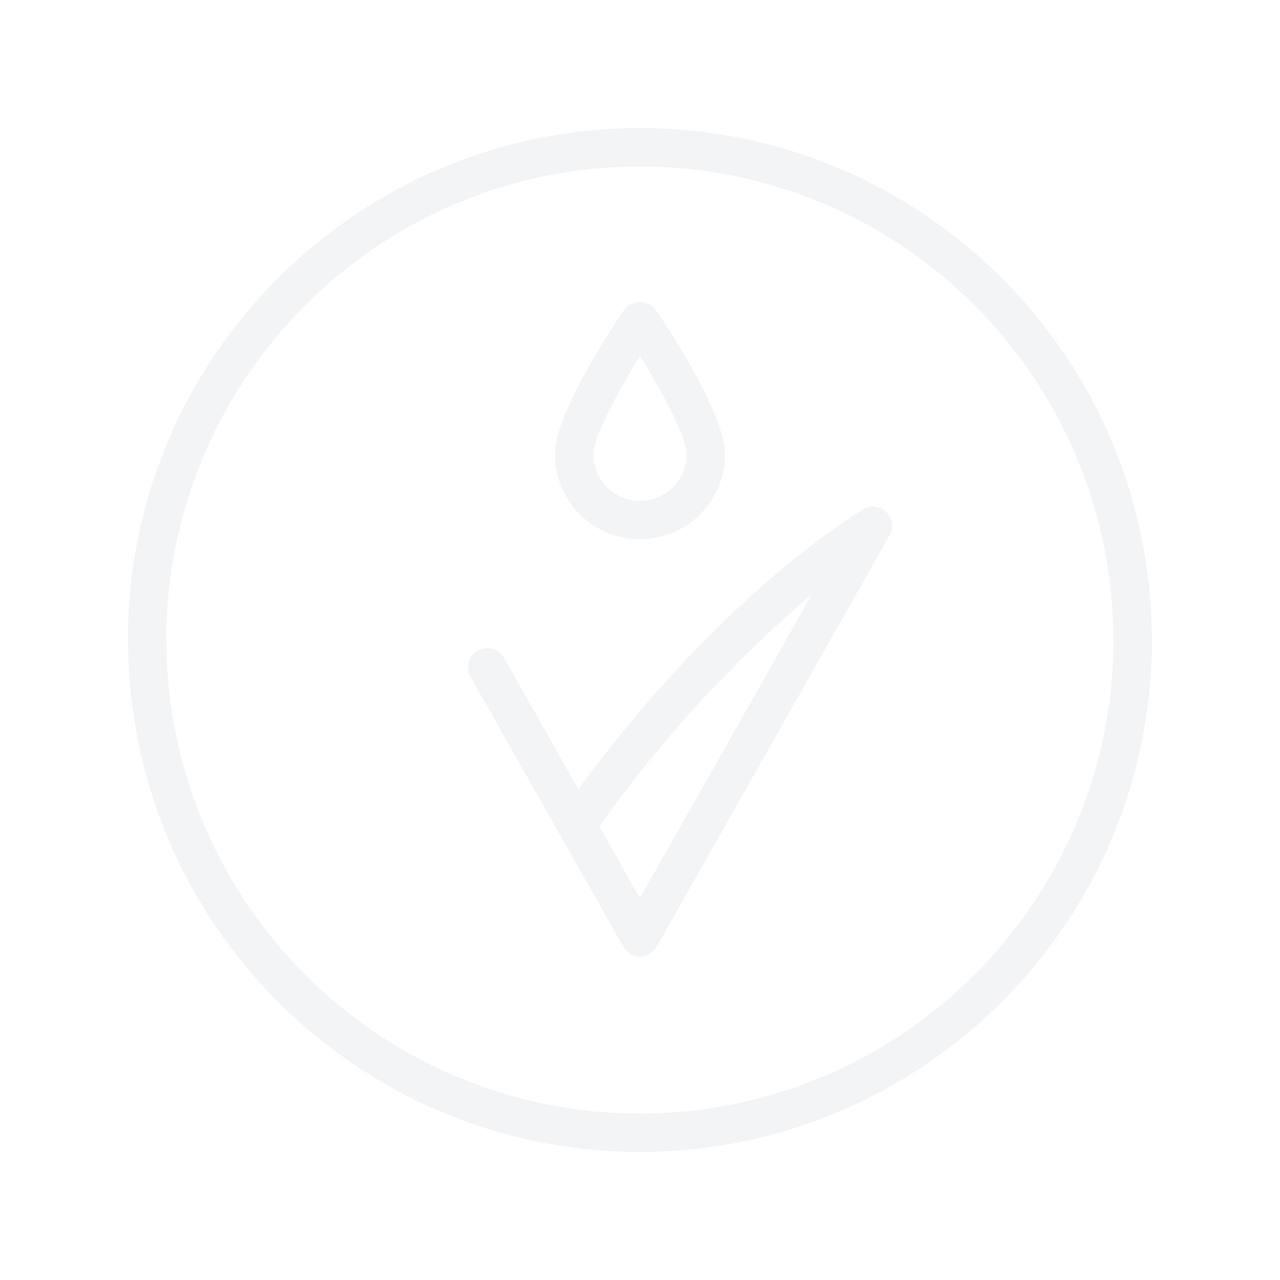 BOURJOIS Rouge Laque Lipstick 6ml